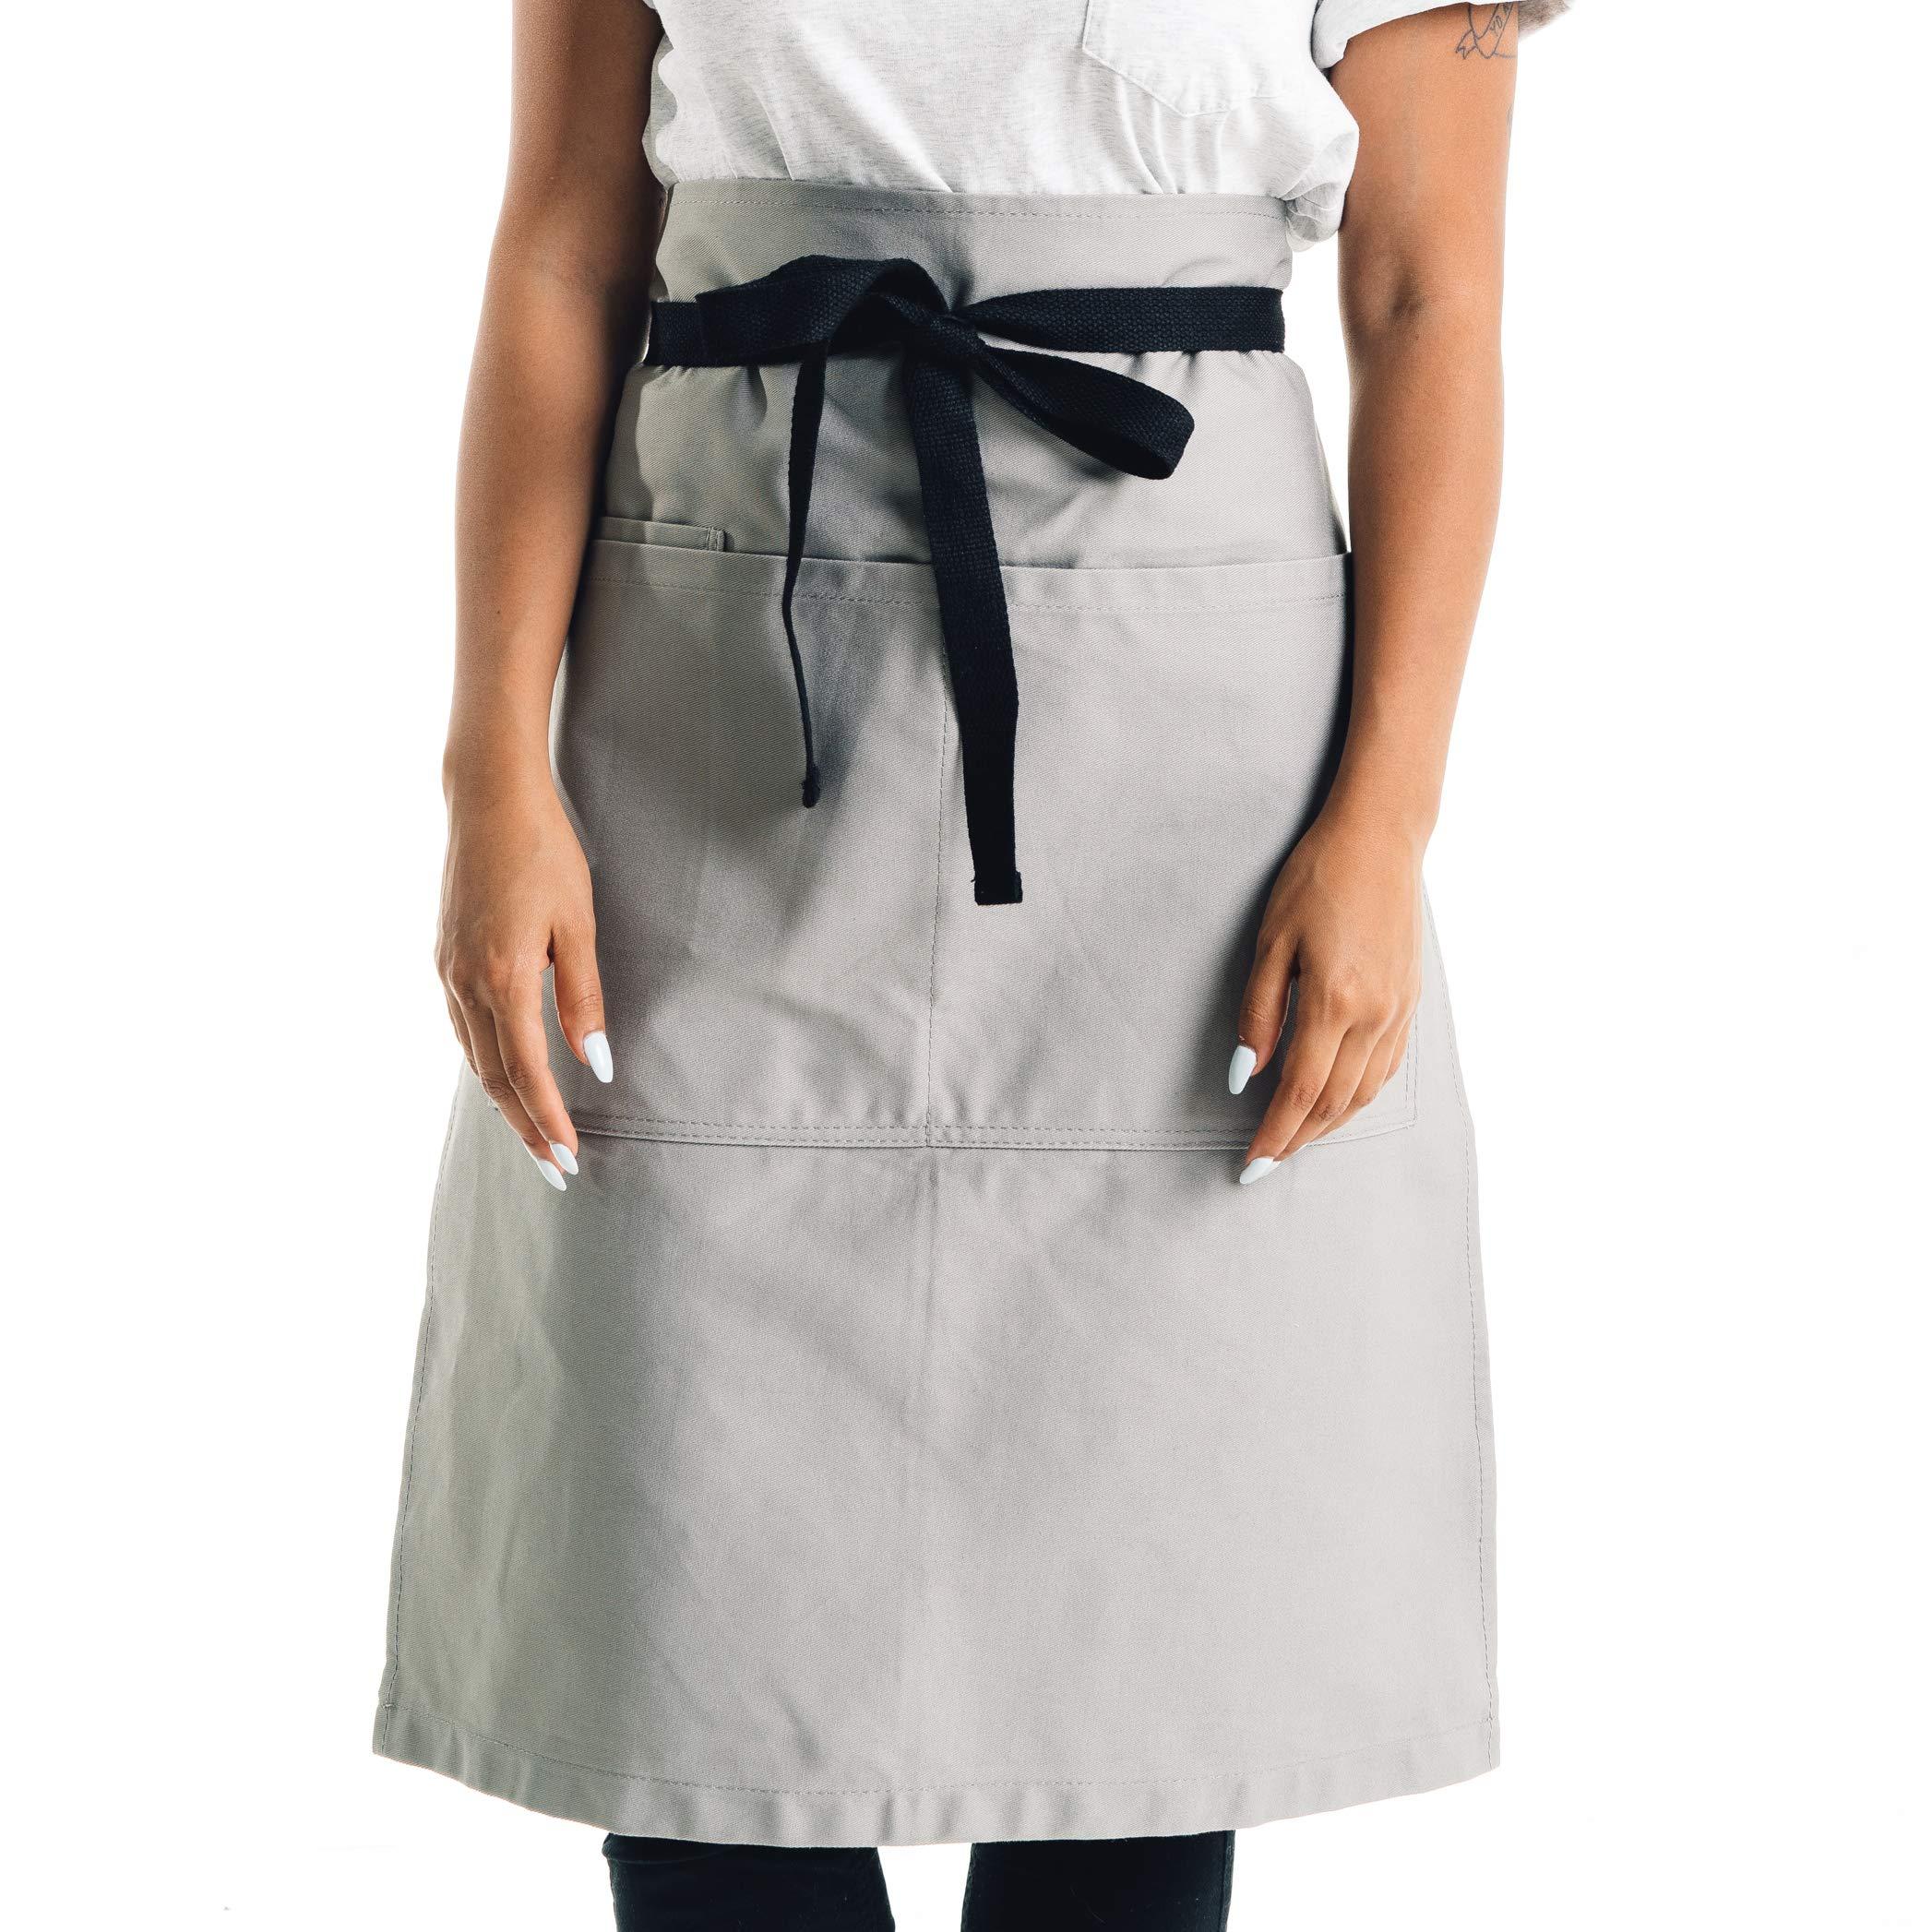 Caldo Cotton Bistro Apron - 3 Pockets, Tall Length 23 x 27 with 40 Inch Waist Ties - Unisex Uniform for Server, Waiter, Waitress, Coffee Shop, Cafe, Bartender, Catering (Grey) by Caldo